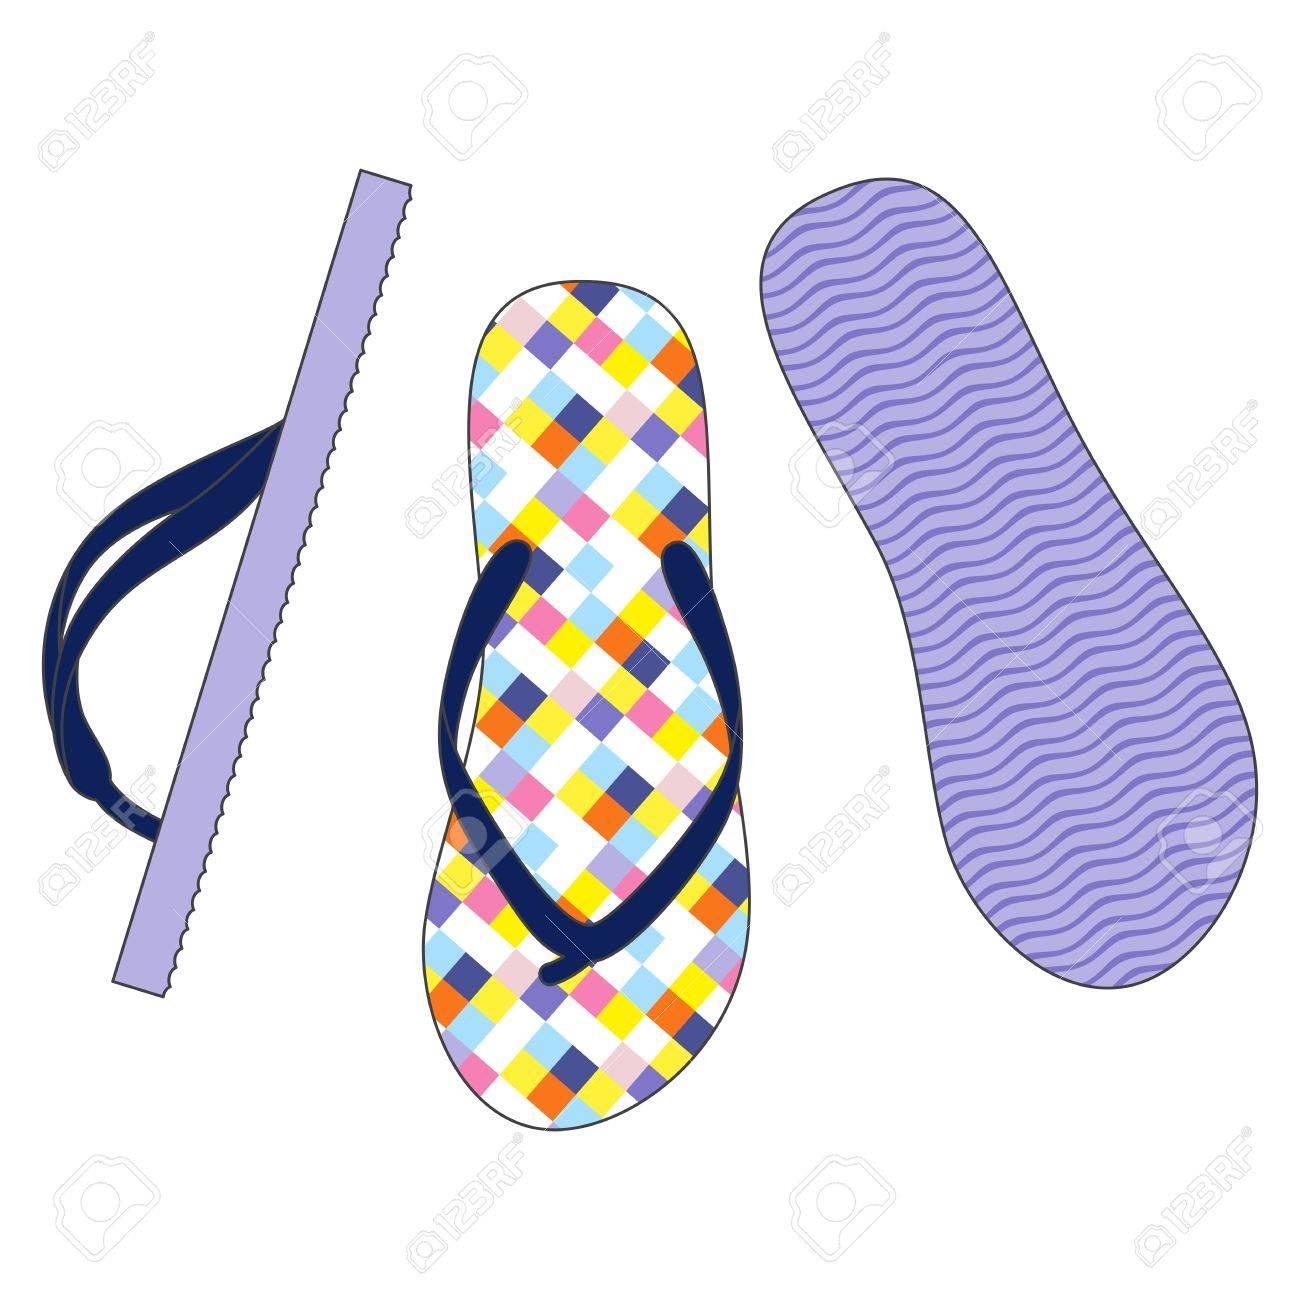 9b484bbb35ea Vector Set Of Colorful Flip Flops Illustration Royalty Free Cliparts ...